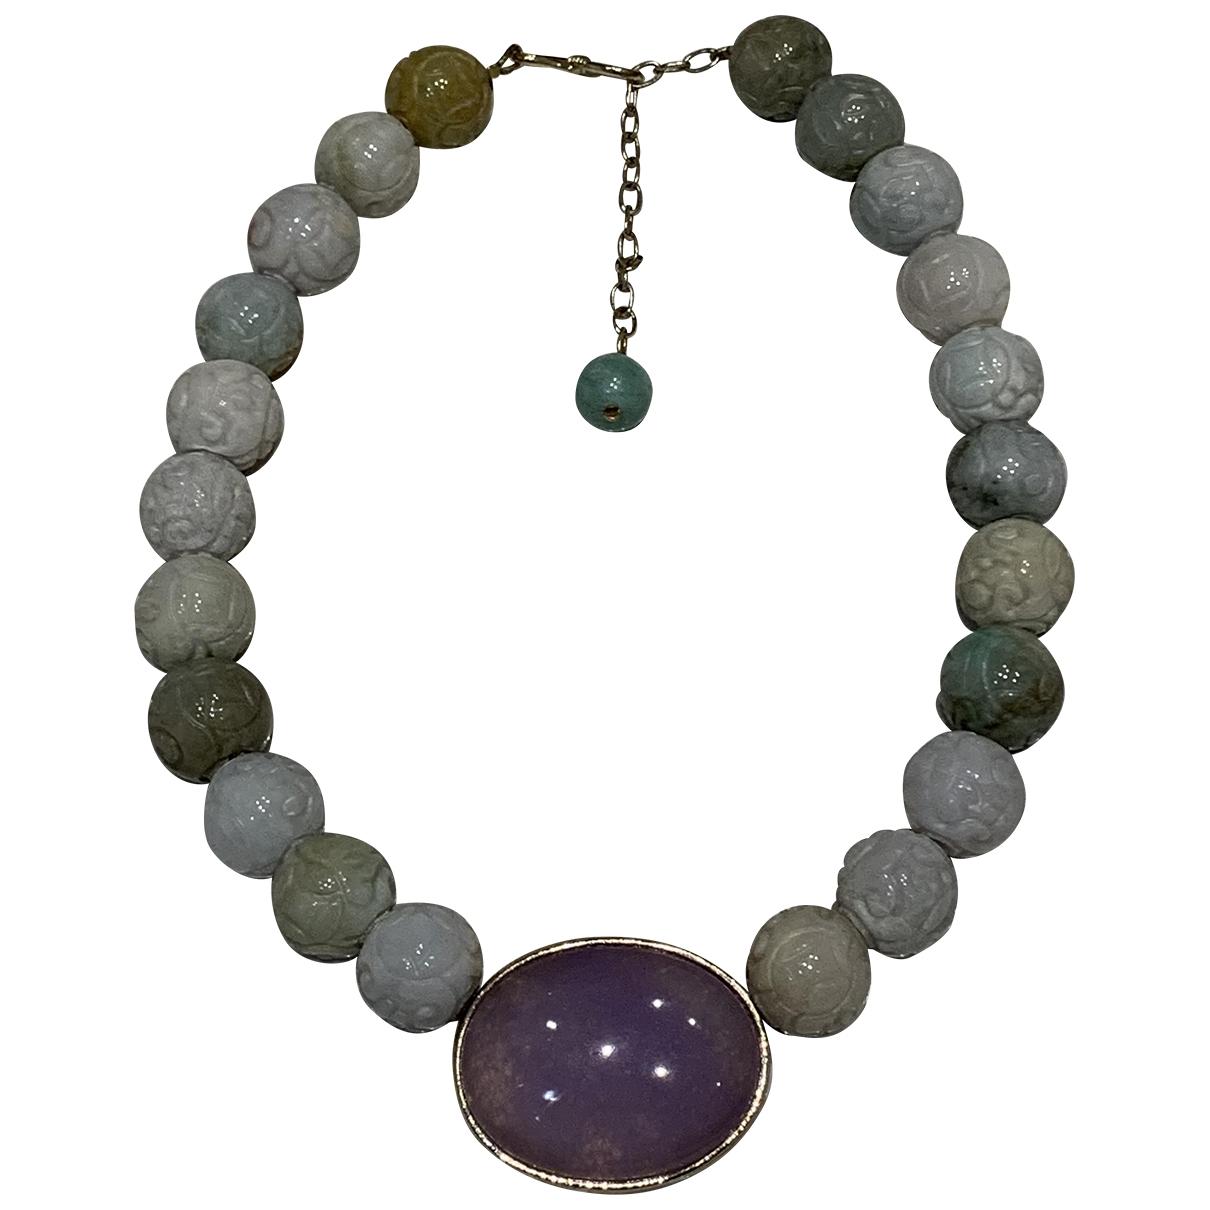 Philippe Ferrandis \N Green Metal necklace for Women \N